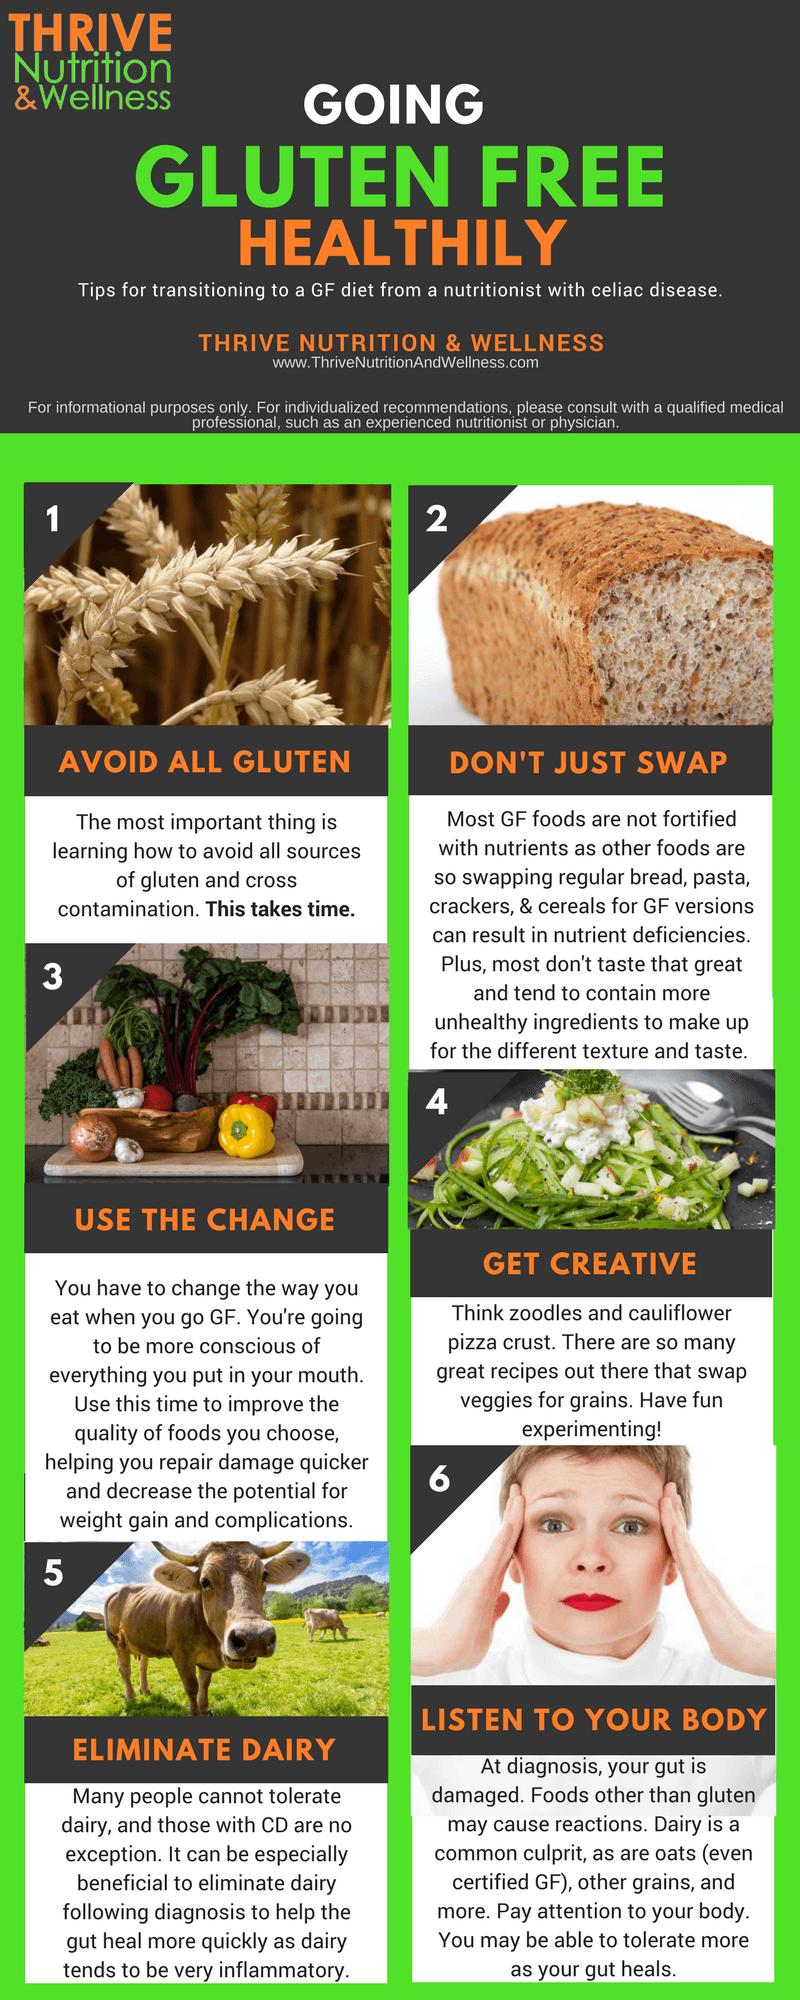 Go-Gluten-Free-Healthily-Infographic